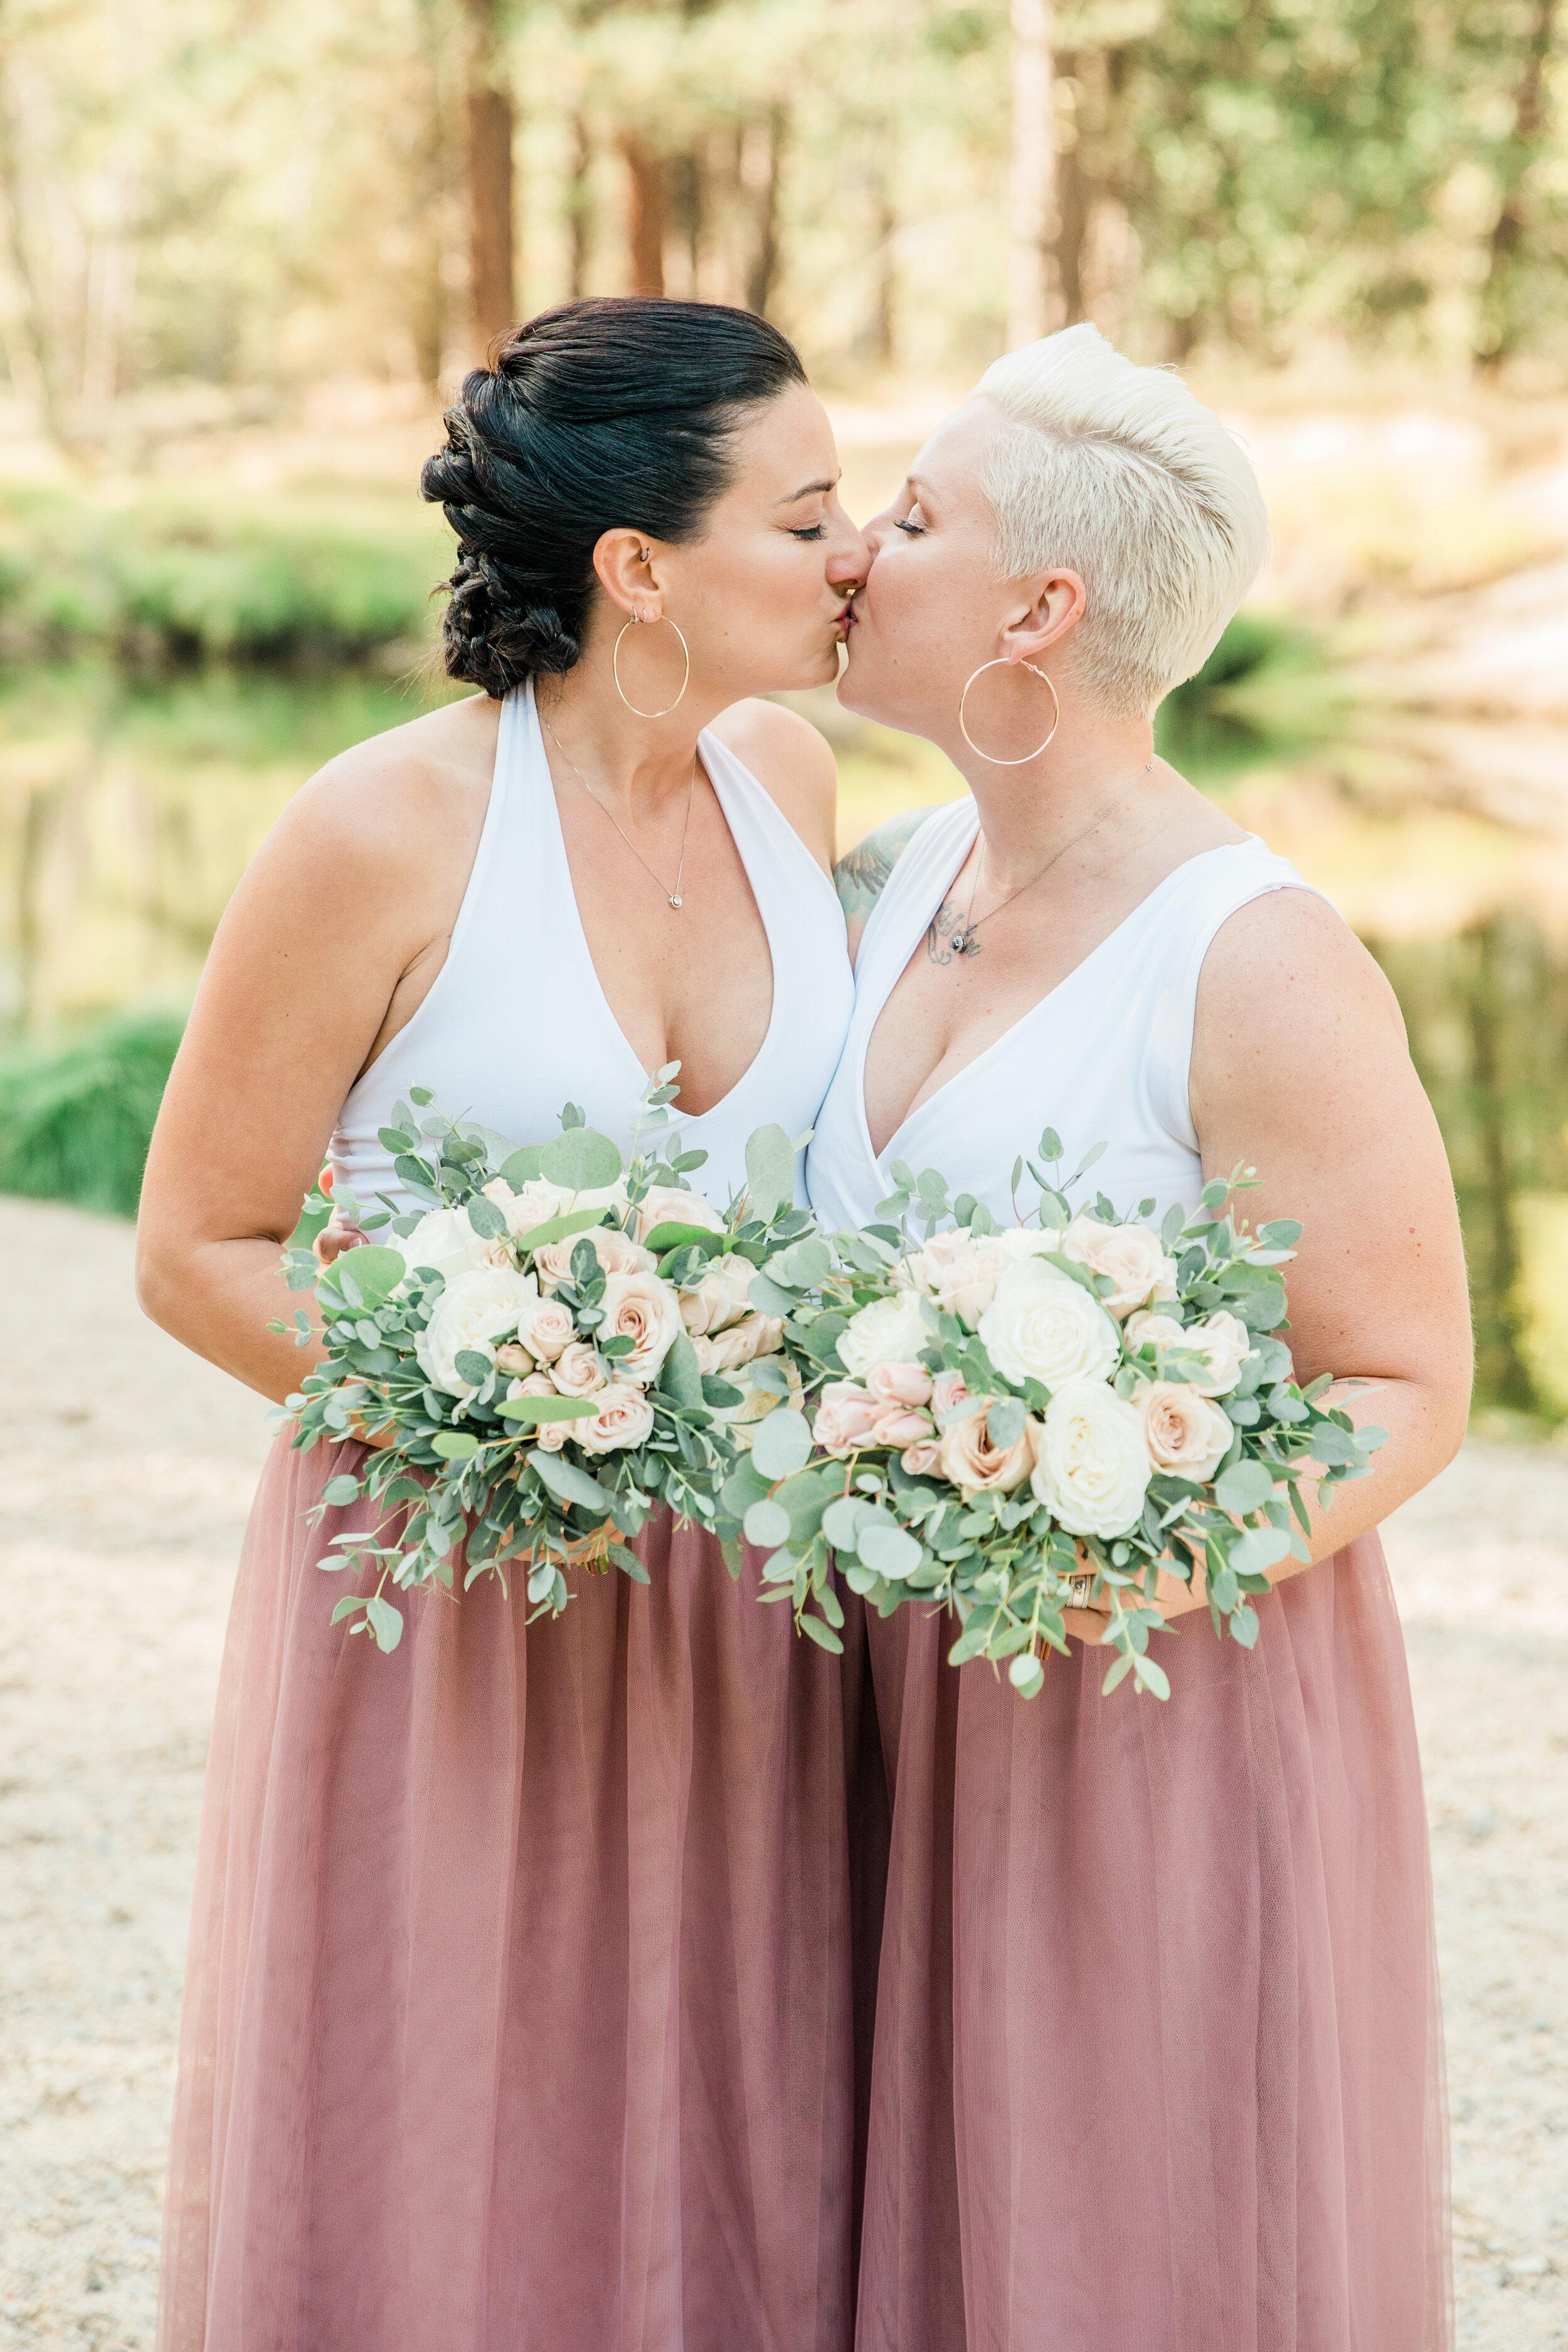 Leanne and Joe - Married - Sneak Peeks - Lauren Alisse Photography-24.jpg